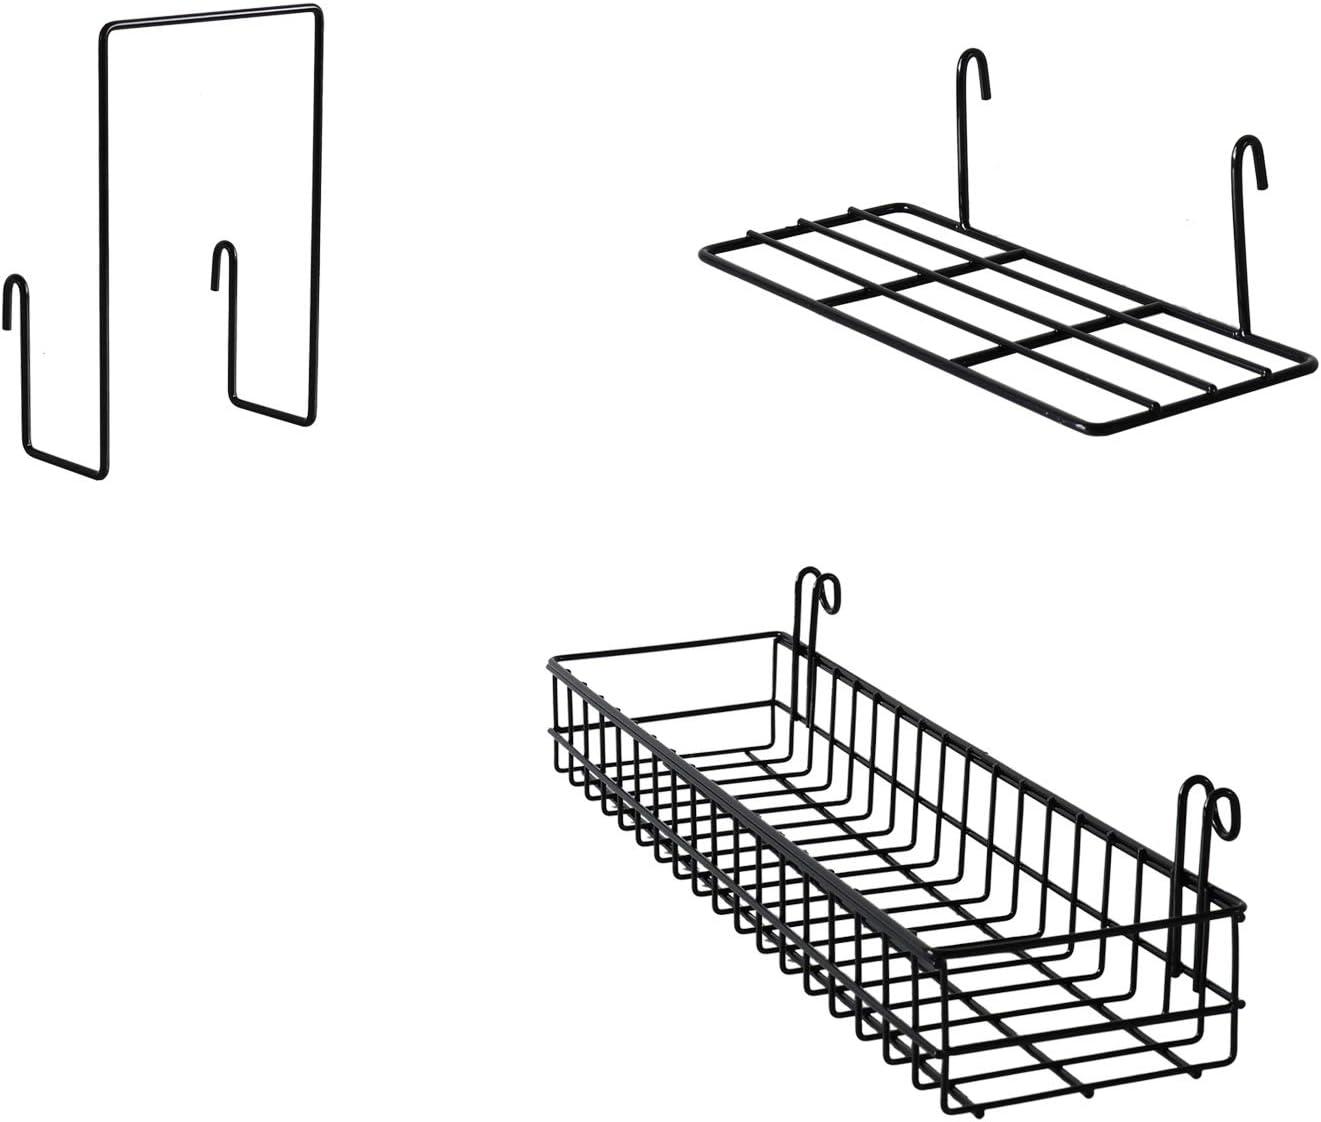 FRIADE Wall Grid Panel Hanging Basket with Hooks,Bookshelf,Display Shelf,Wall Organizer and Metal Shelving for Home Supplies,1 Set of 3 (Black)